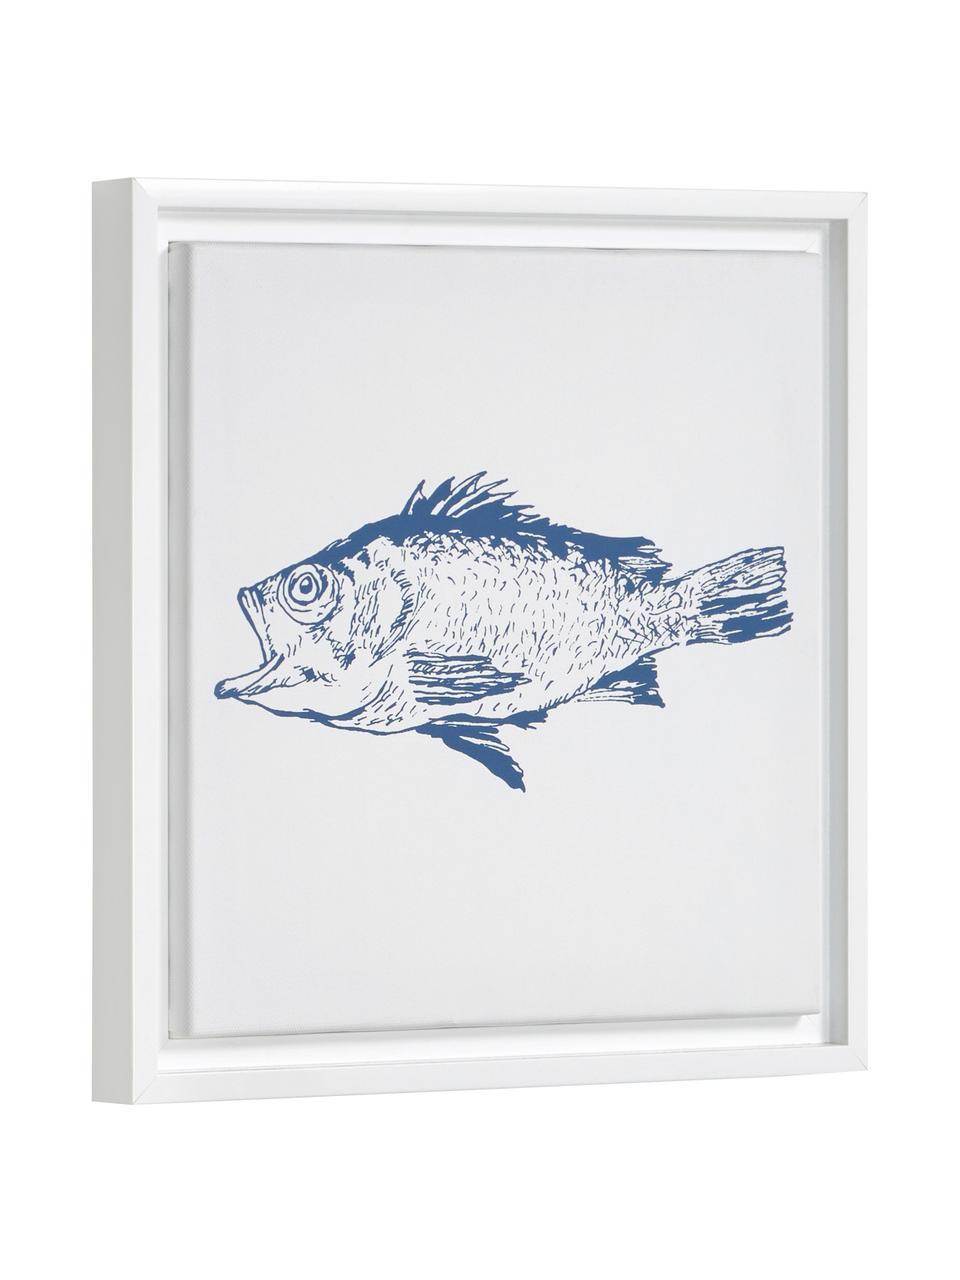 Gerahmter Digitaldruck Lavinia Fish, Rahmen: Mitteldichte Holzfaserpla, Bild: Leinwand, Weiss, Blau, 30 x 30 cm